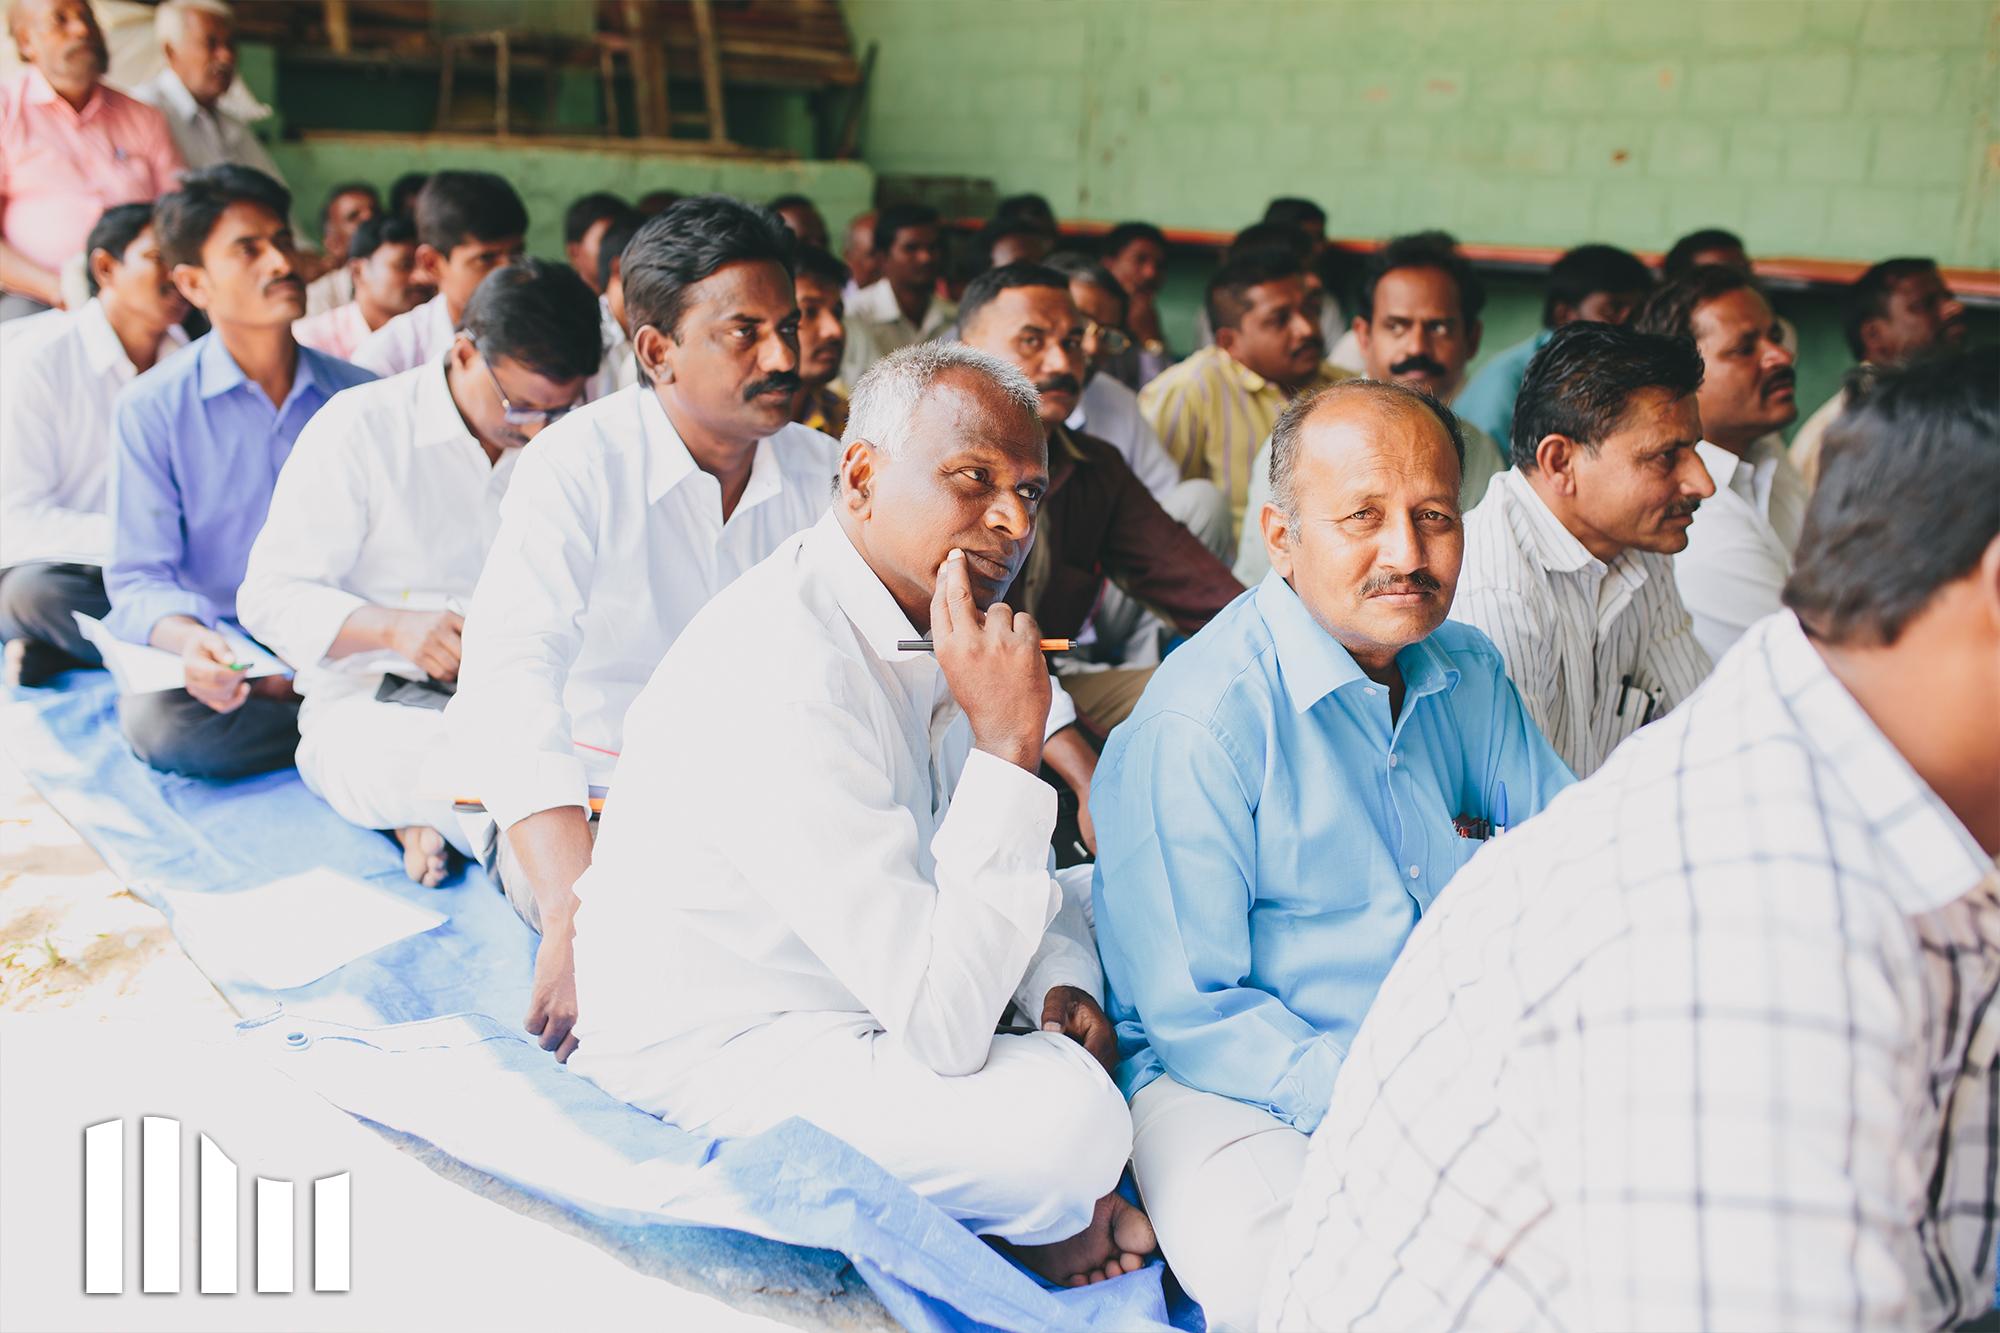 Audio Scripture Ministries preparing beta release of biblical app in India